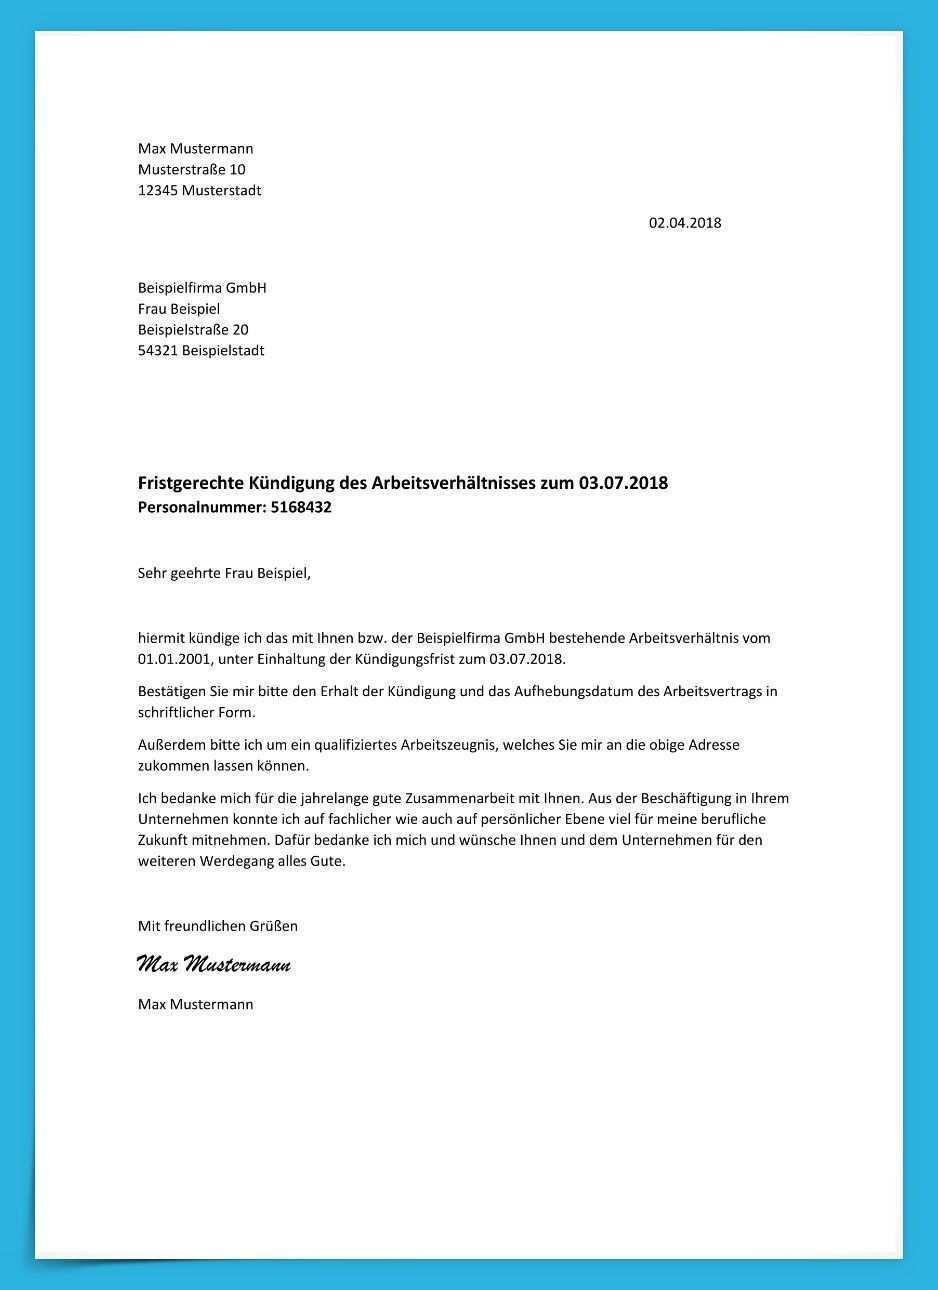 Detaillierte Arbeitsvertrag Kundigung Muster Demande D Emploi Dessin A Imprimer A Imprimer